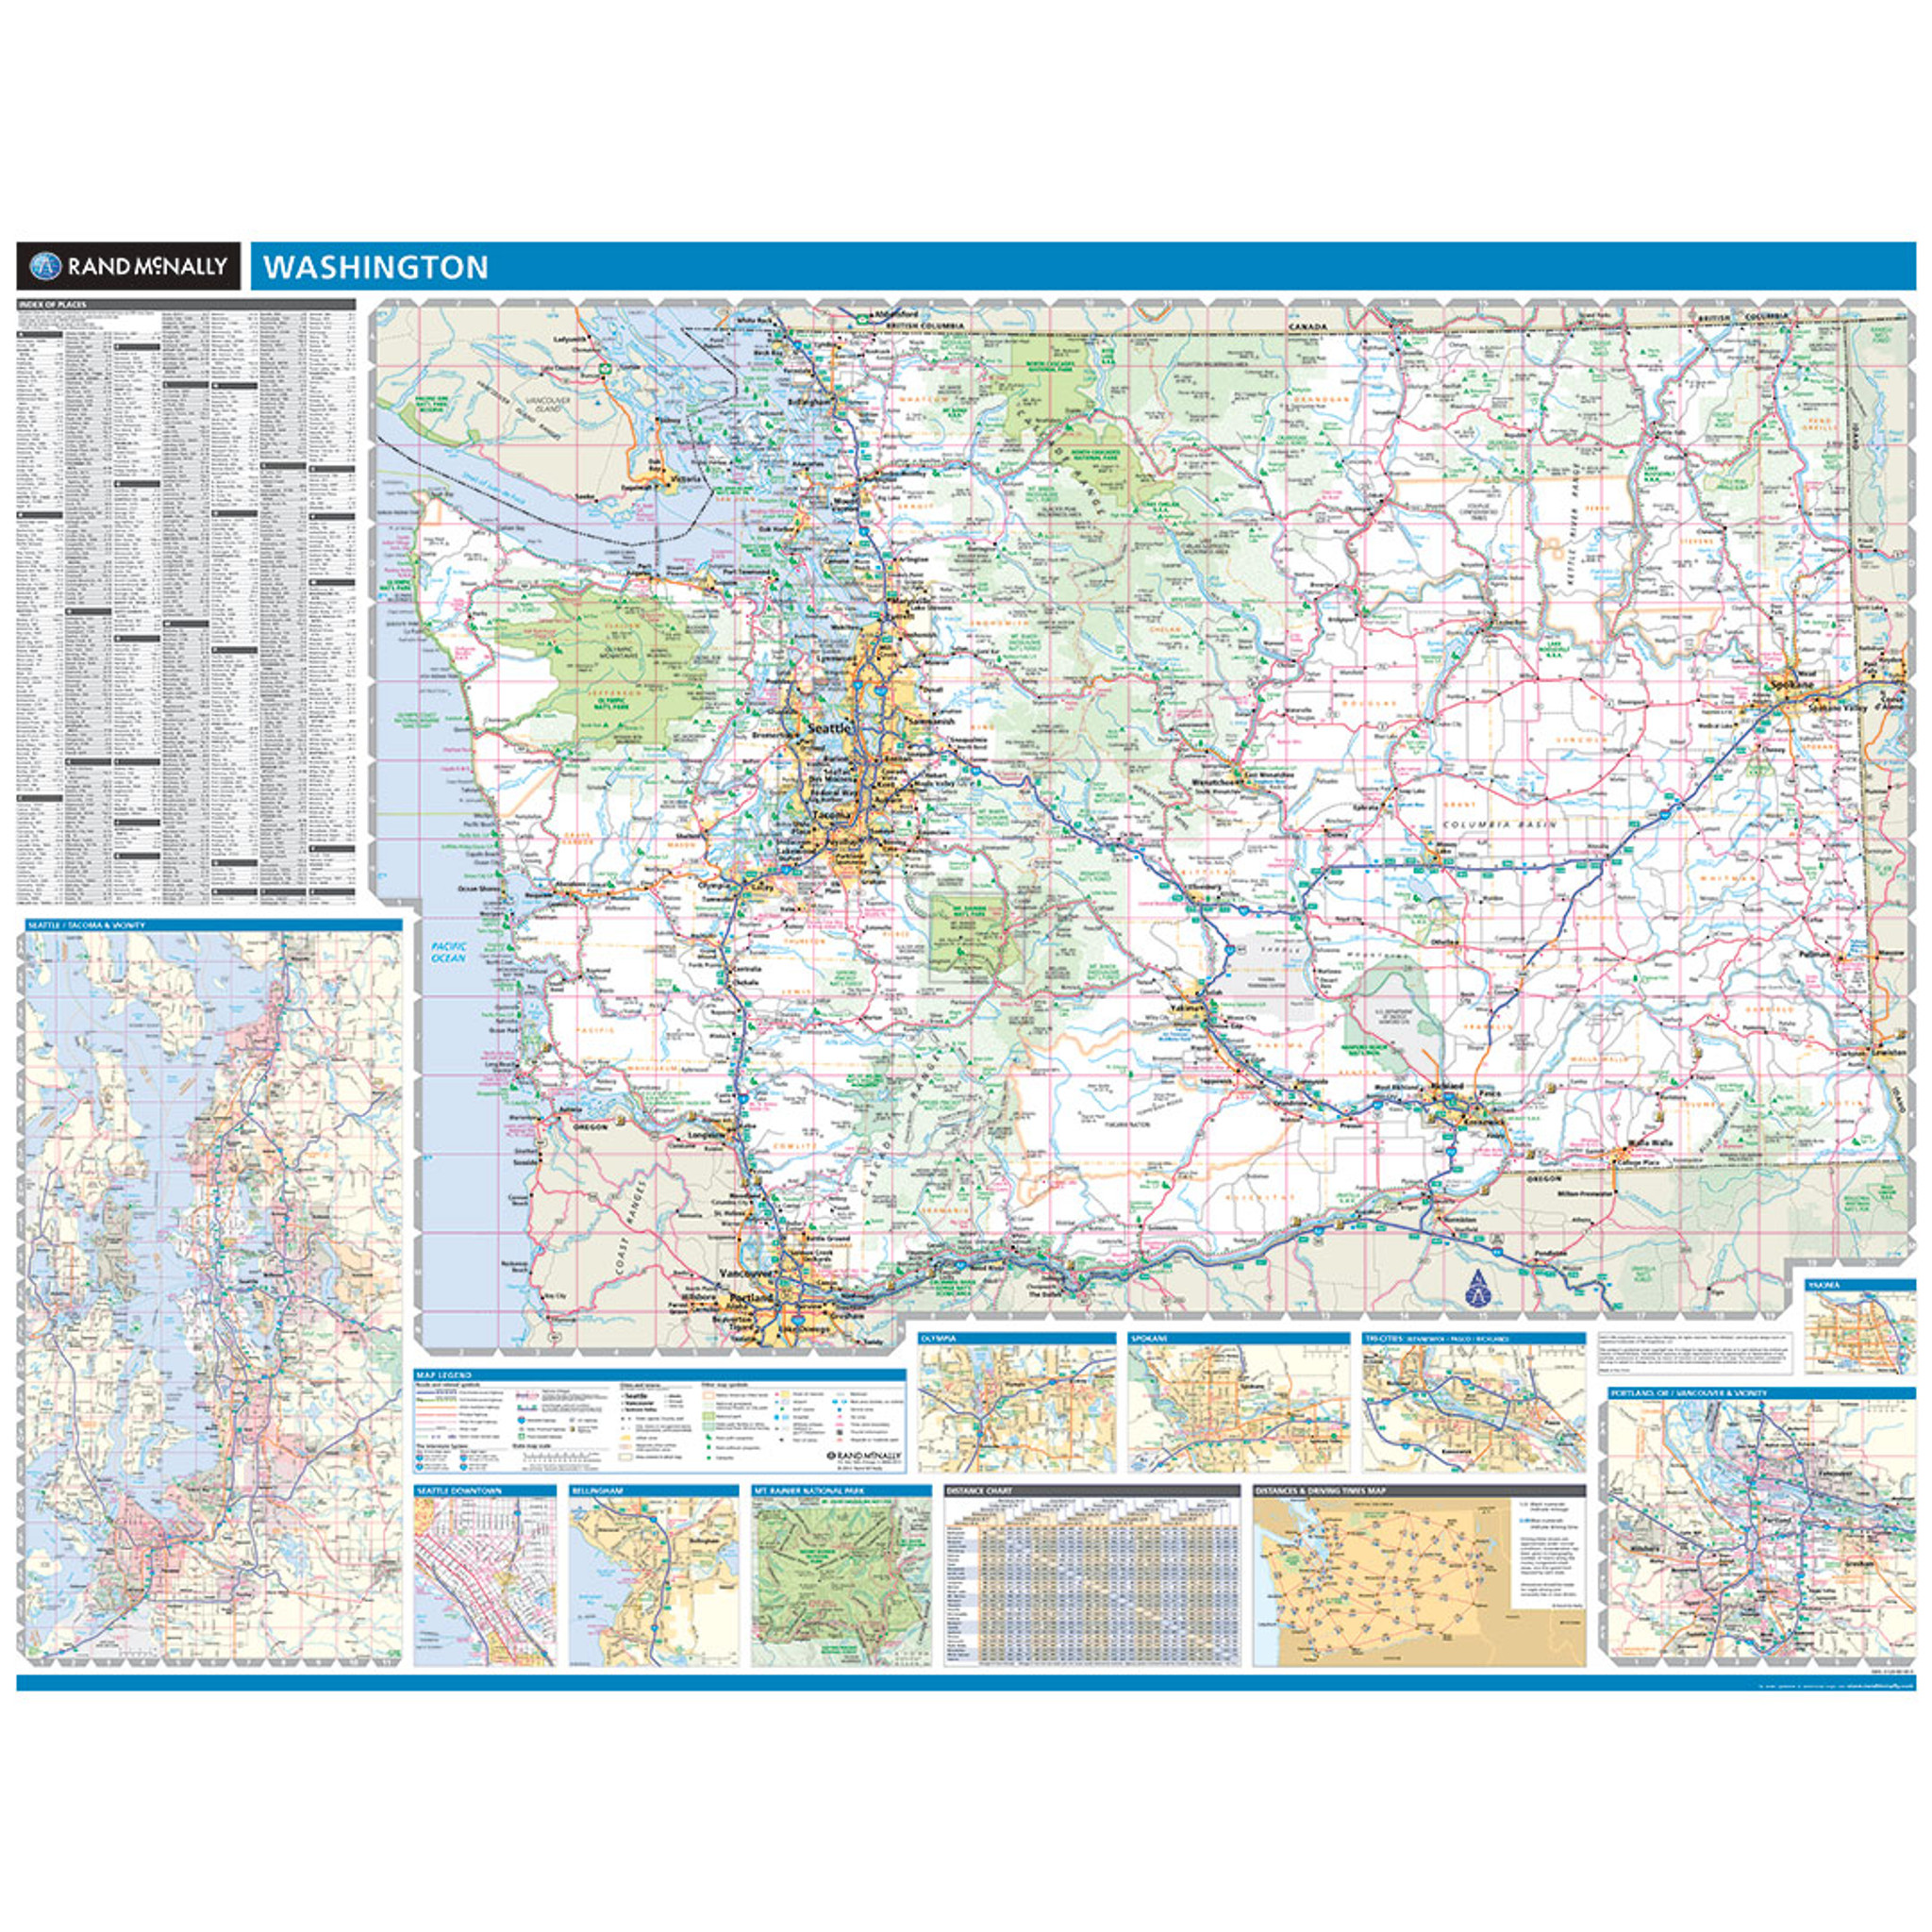 Rand McNally Washington State Wall Map